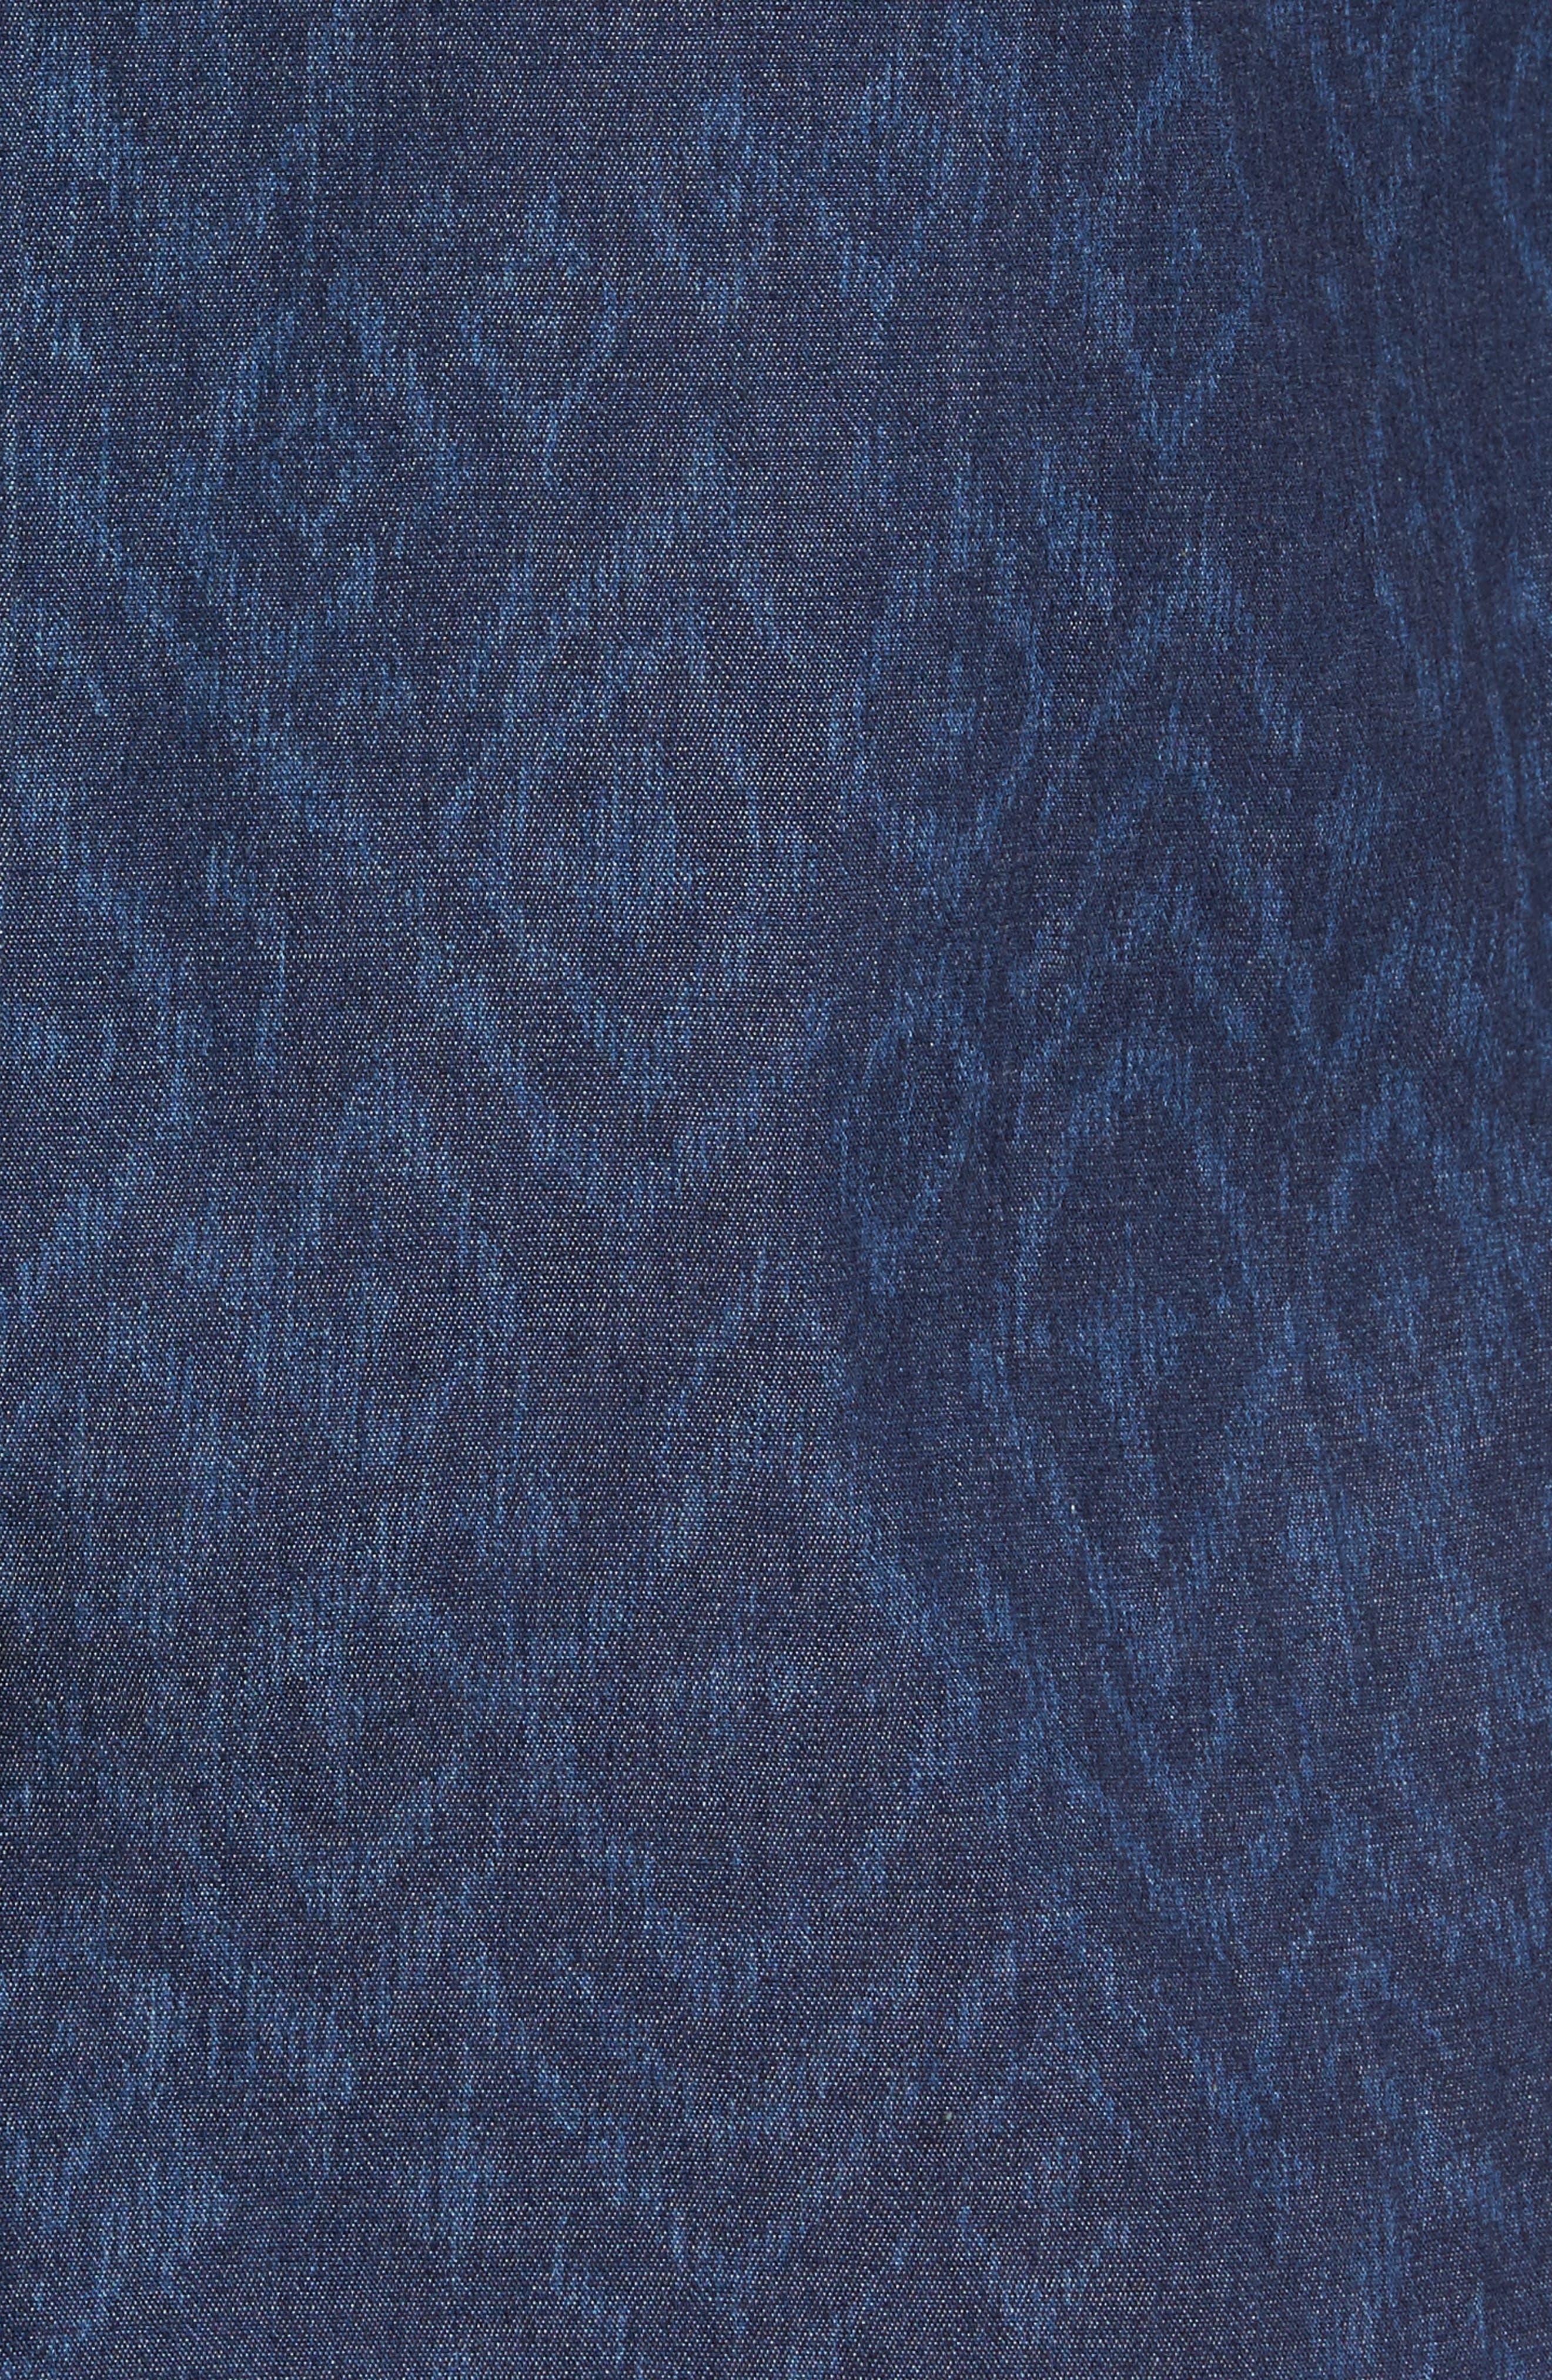 Marquee Moon Print Woven Shirt,                             Alternate thumbnail 5, color,                             410